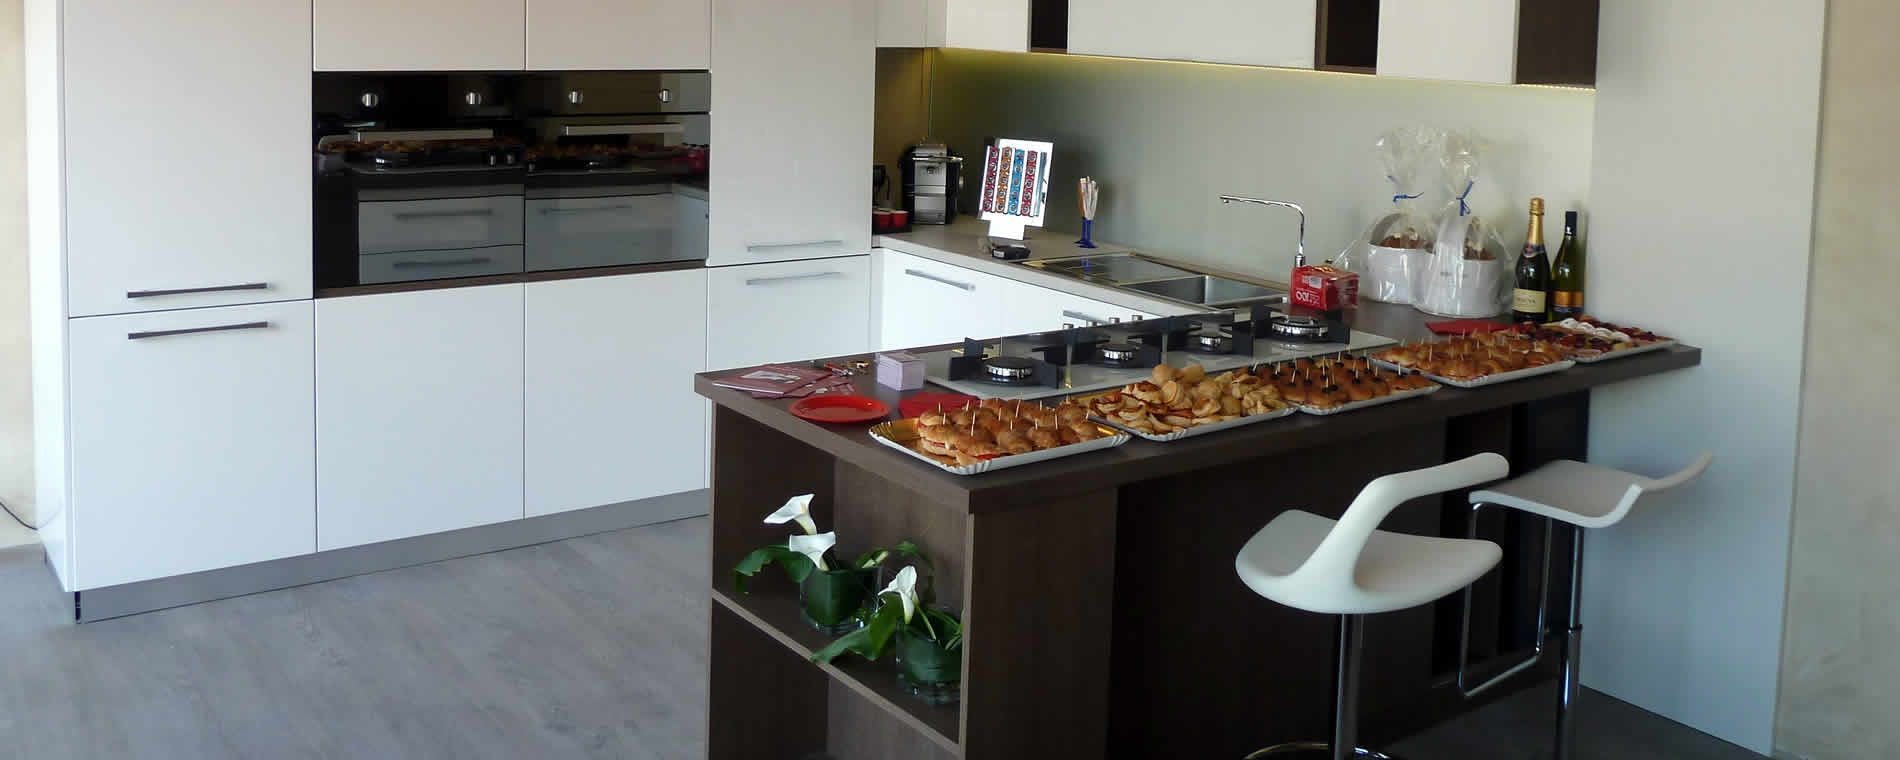 Cucina laccata bianca, piano wengè e sgabelli assortiti ...